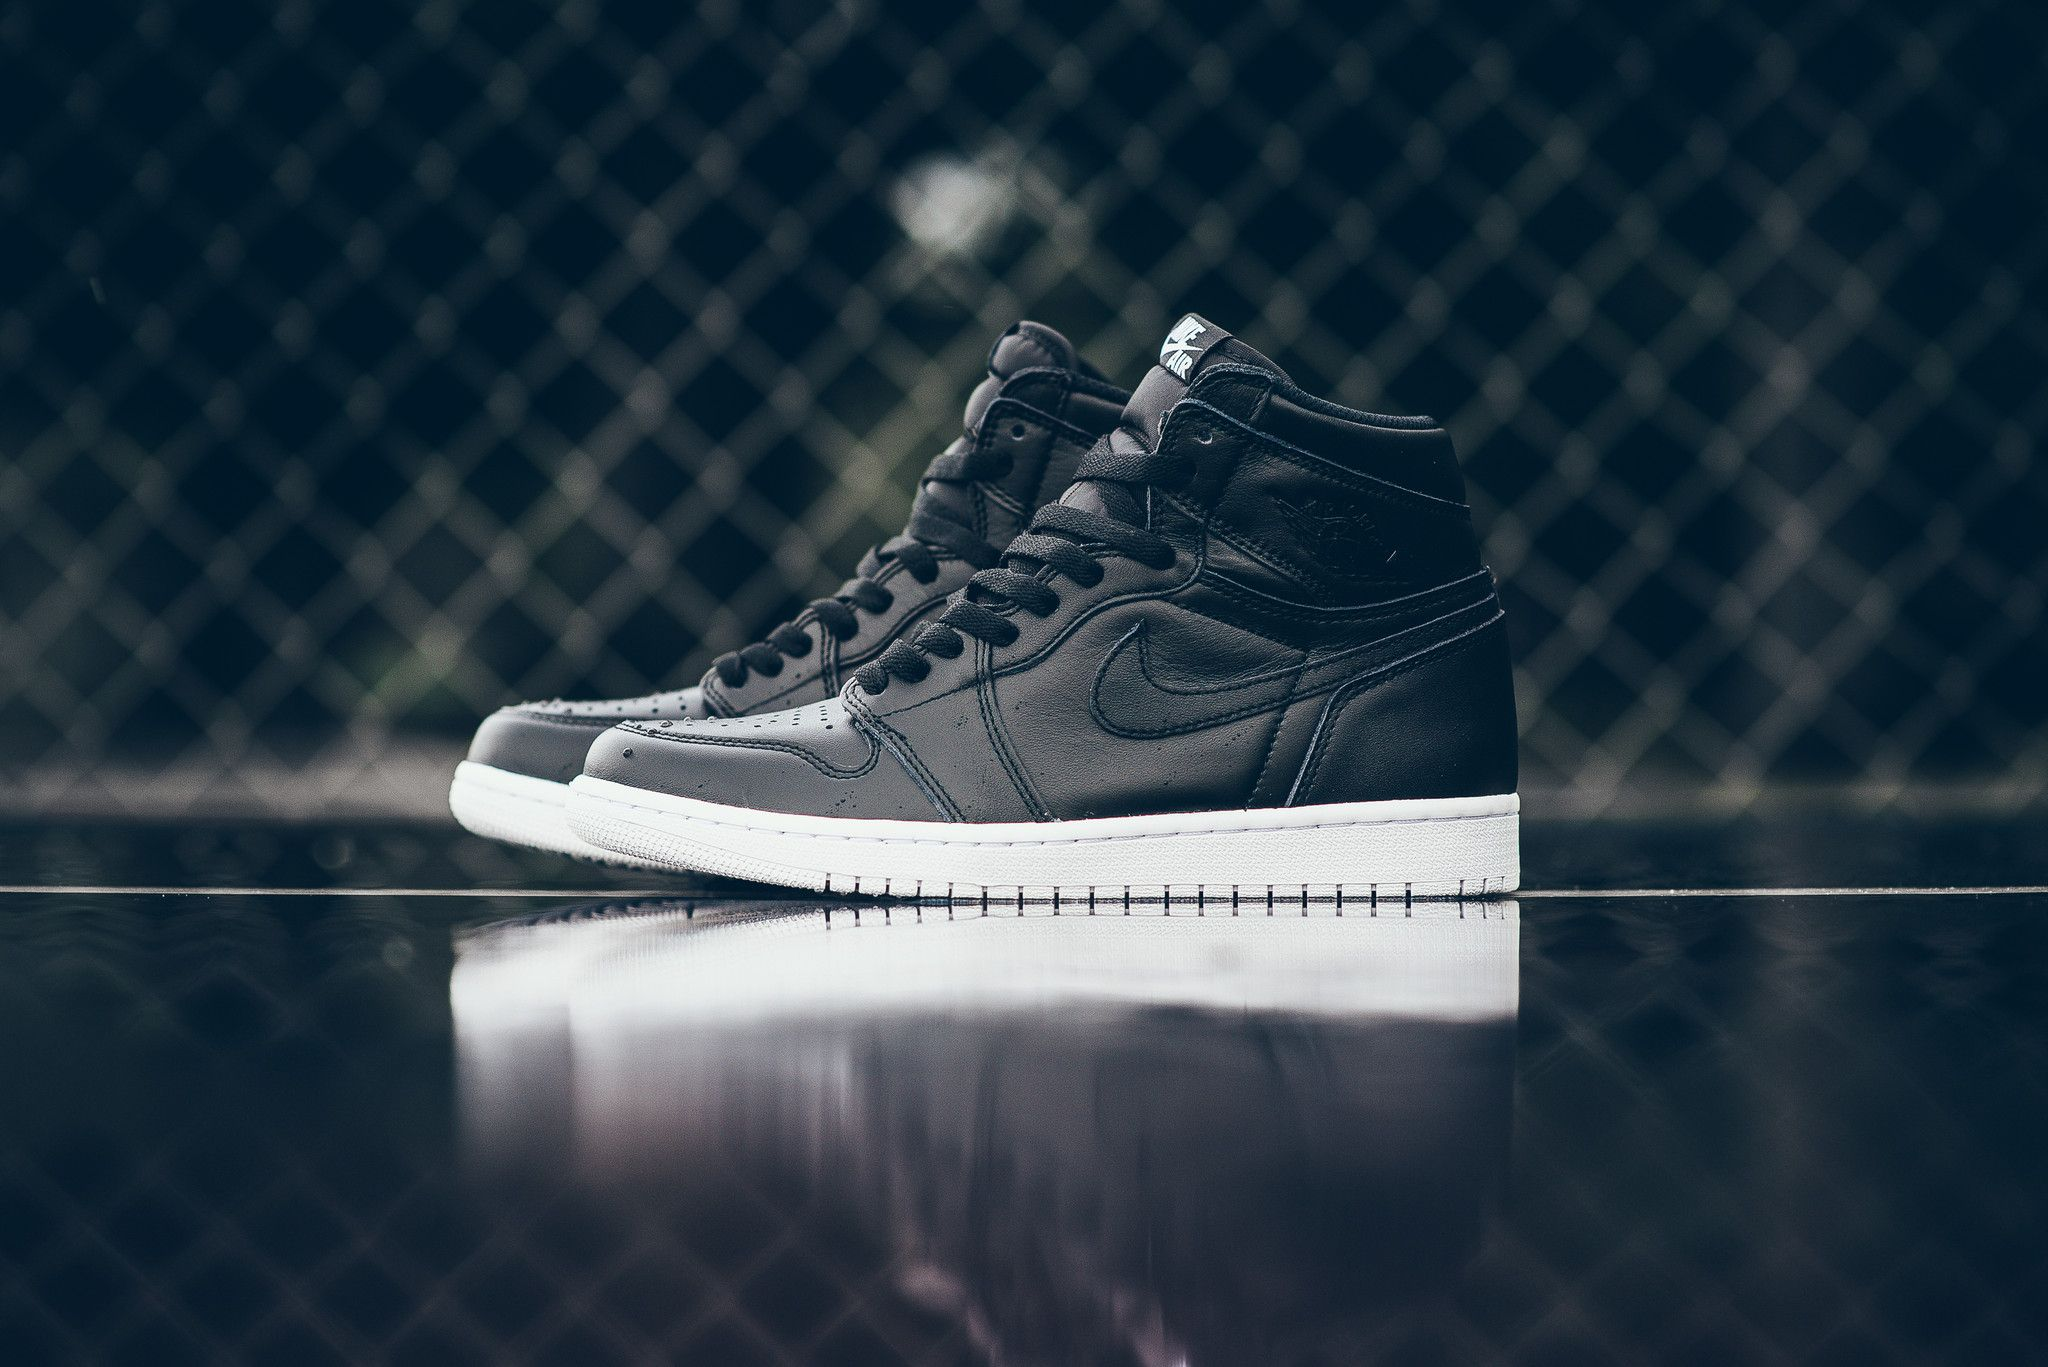 Air Jordan 1 Retro High Og Cyber Monday Air Jordans Jordan 1 Retro High Shoes Sneakers Nike